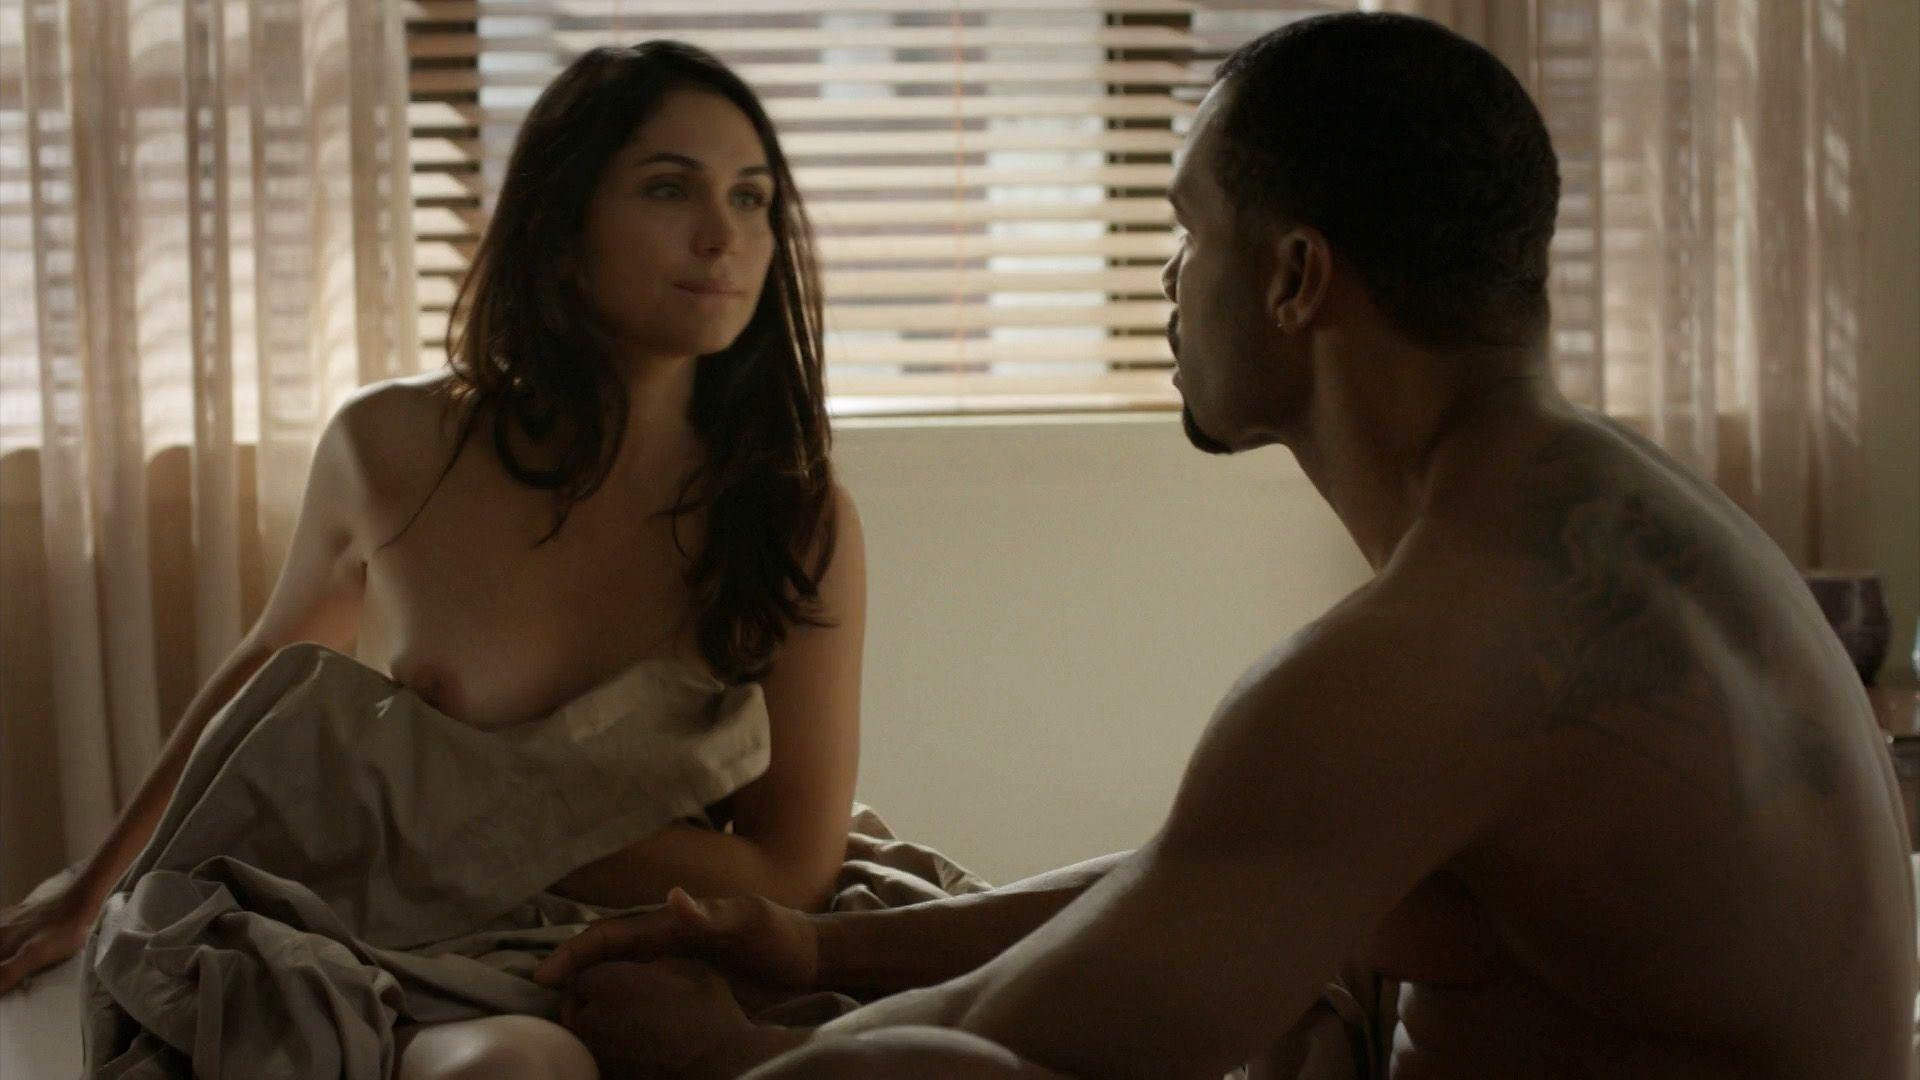 Lela Loren Nude Pics